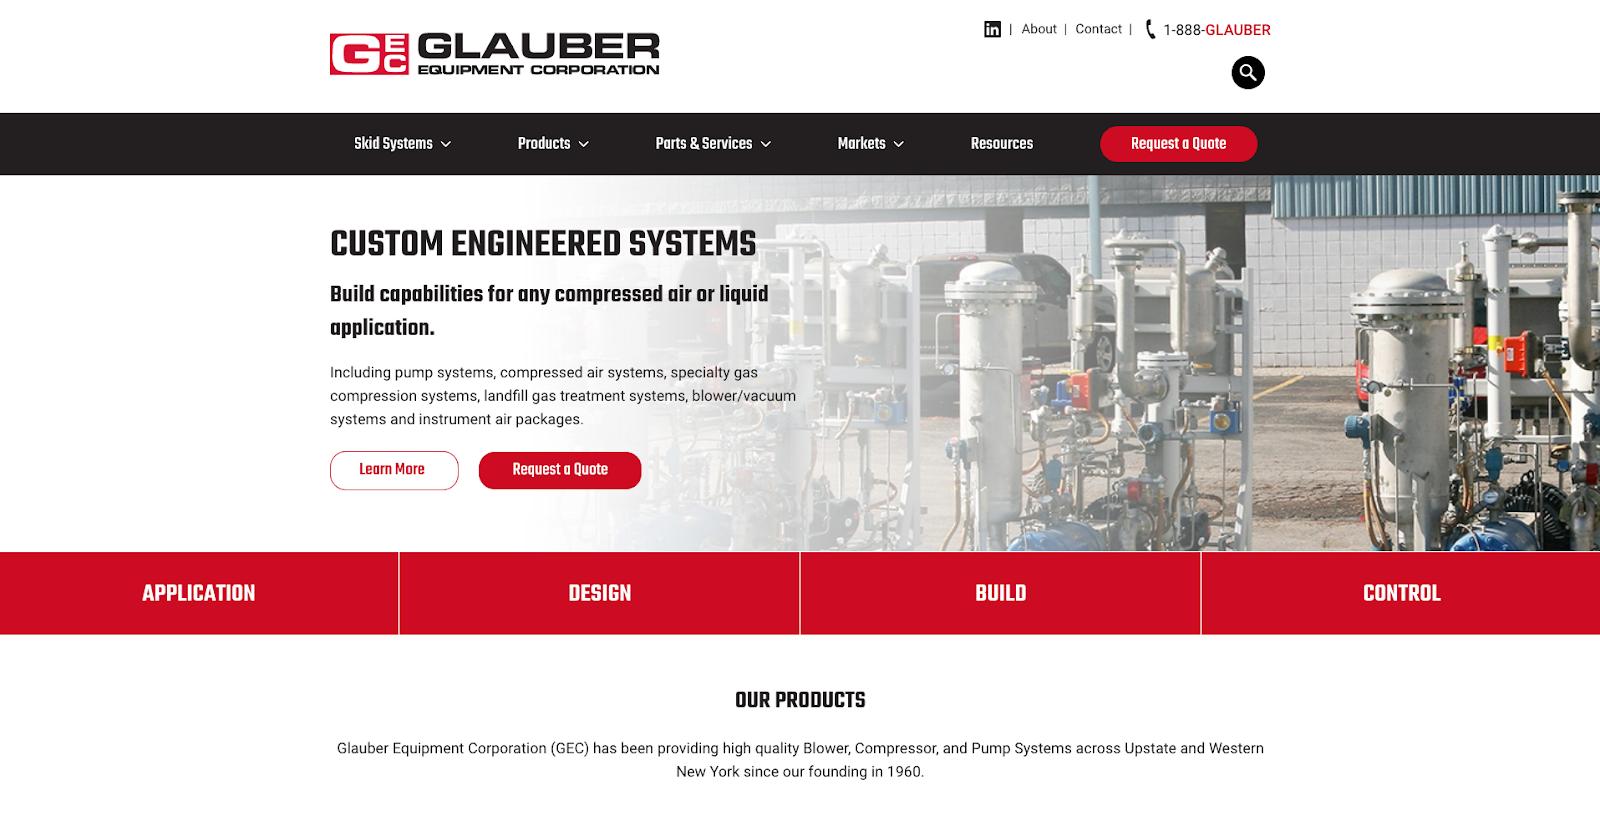 Glauber Homepage